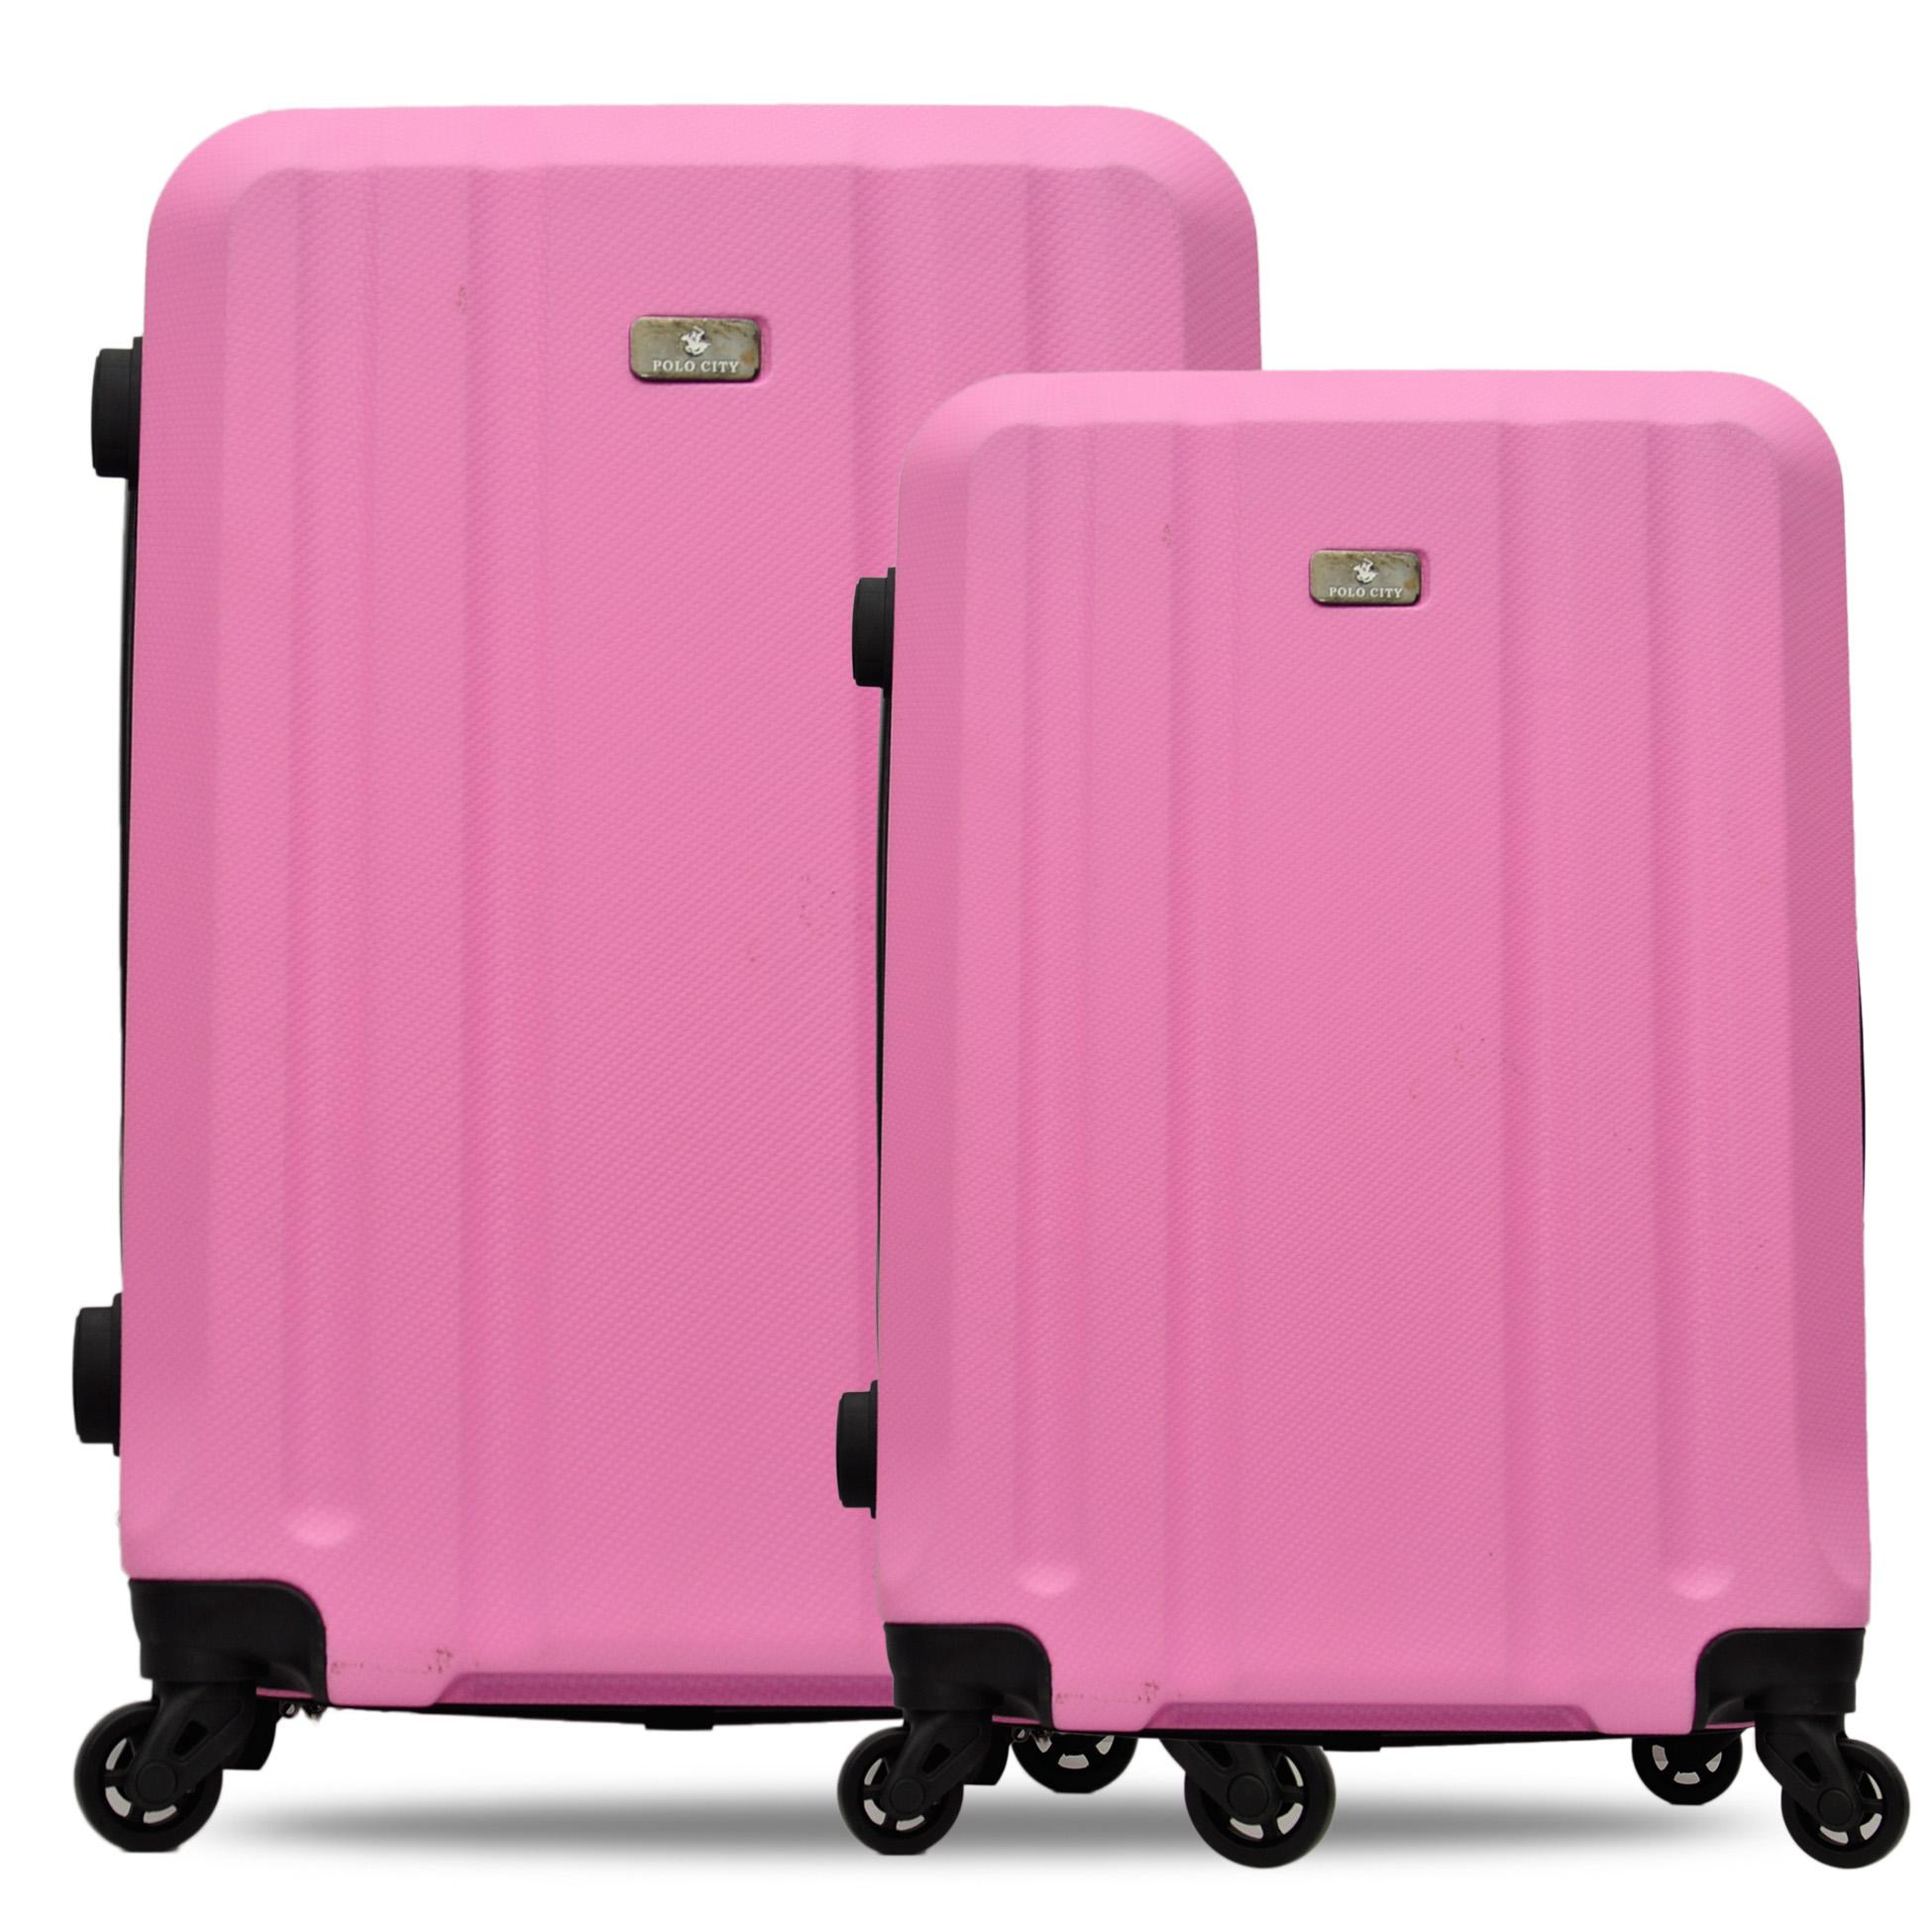 Polo City Tas Koper Hardcase SET size 20 24 inch 304